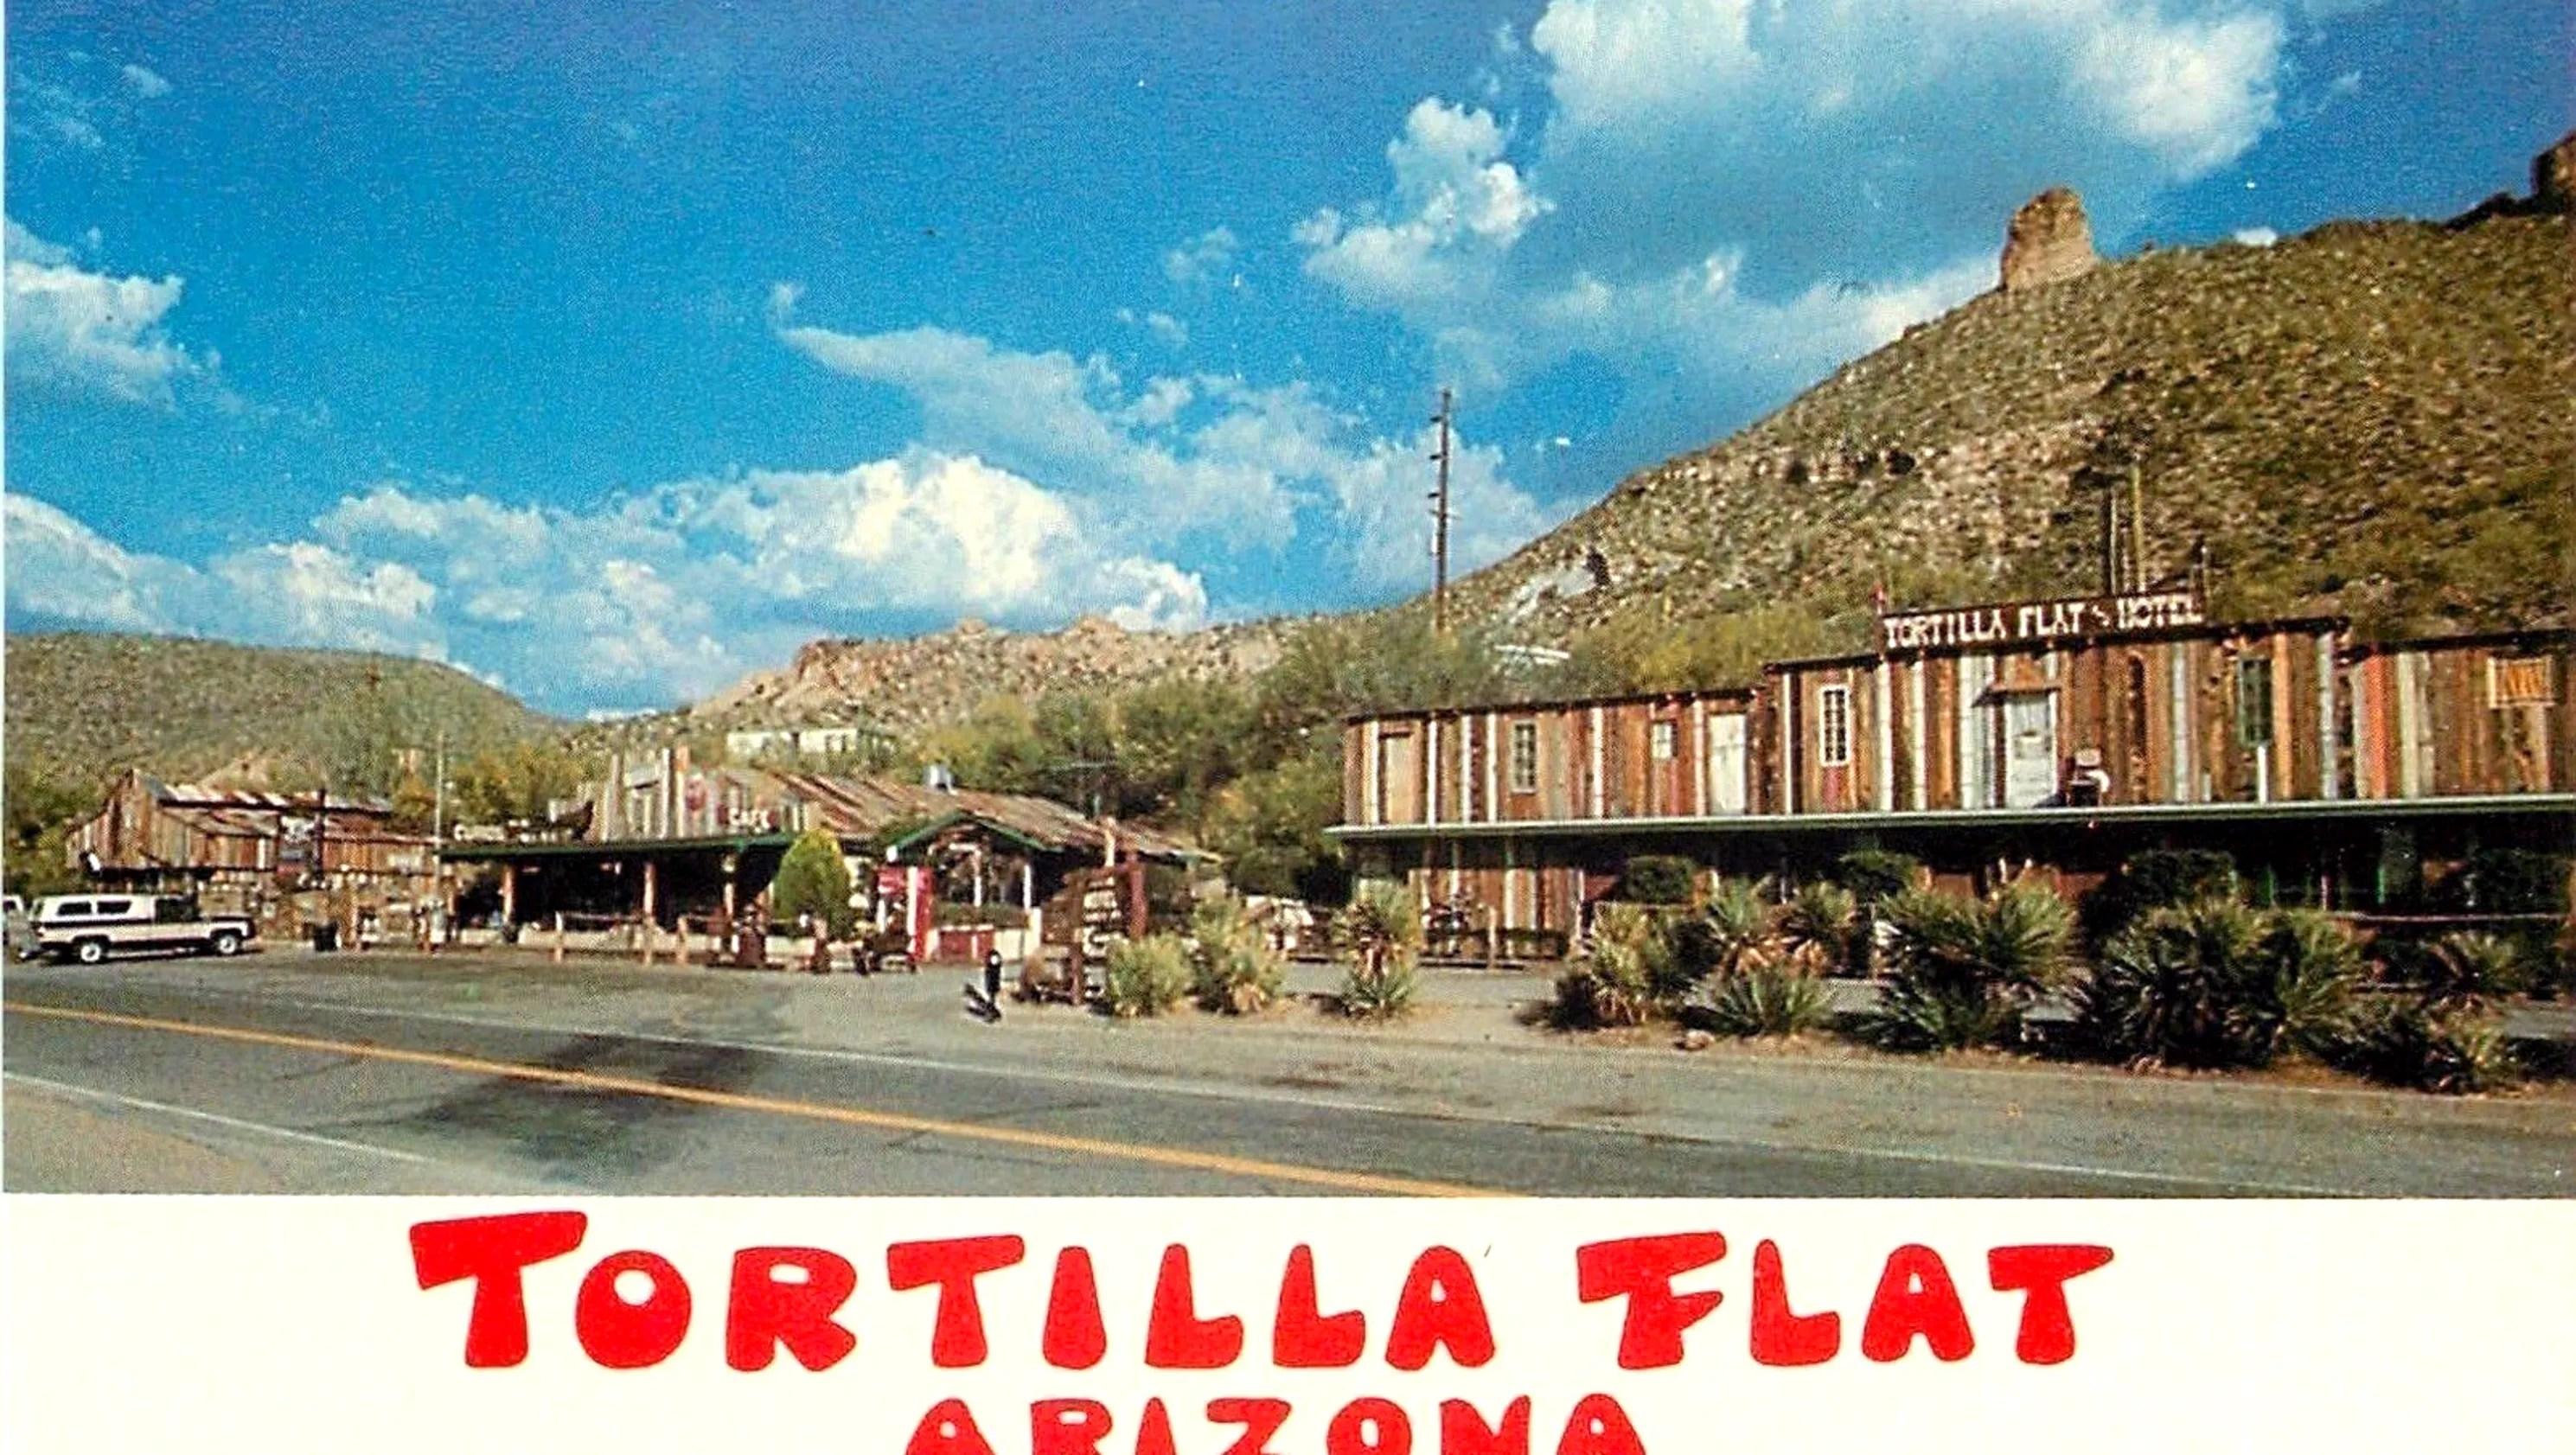 Population Flat Az Tortilla